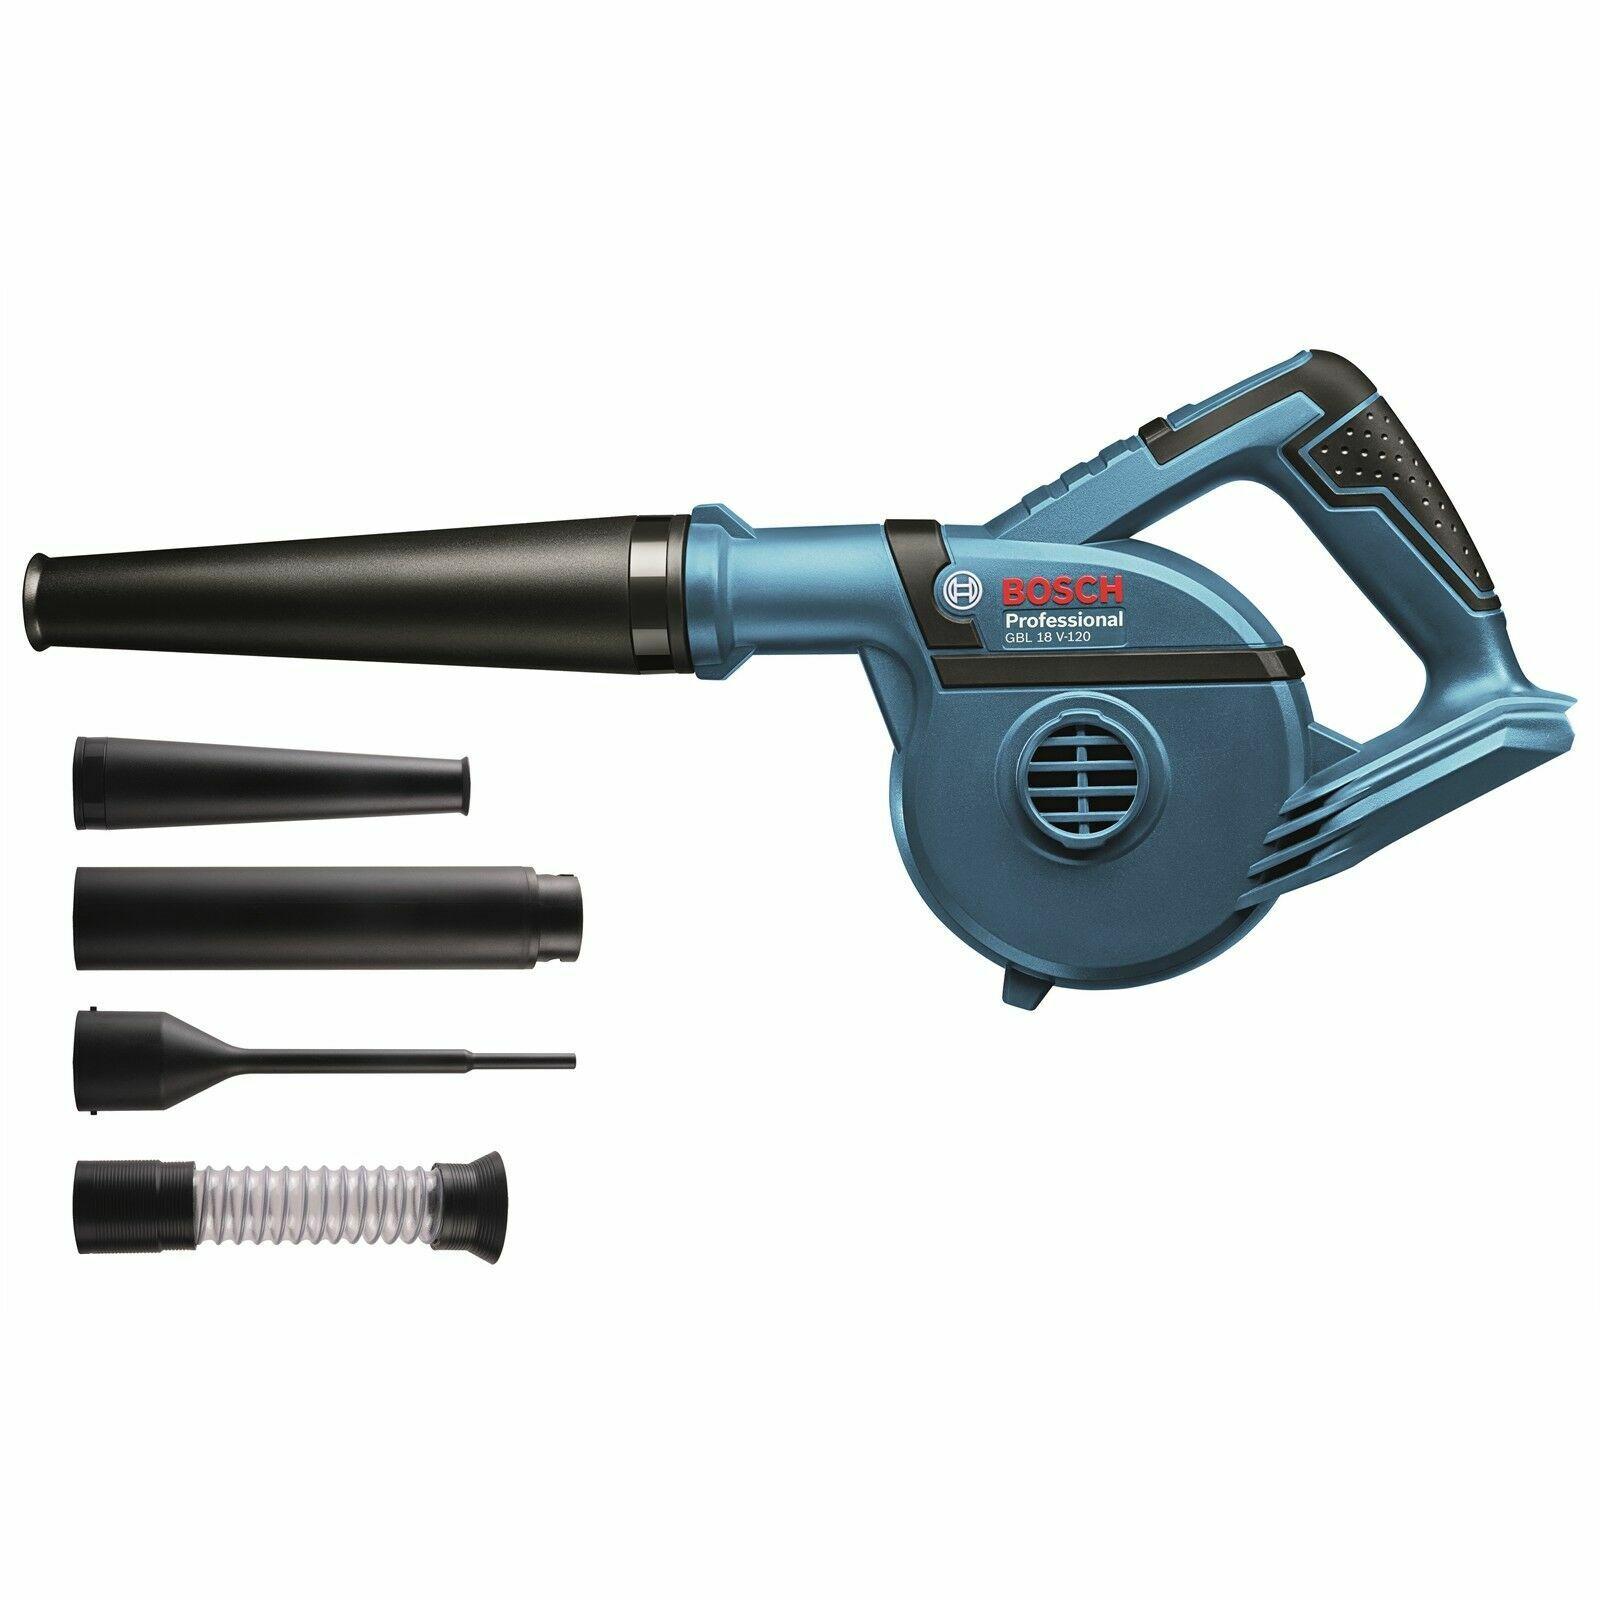 Bosch Blue GBL 18V-120 Professional Blower - Skin Only